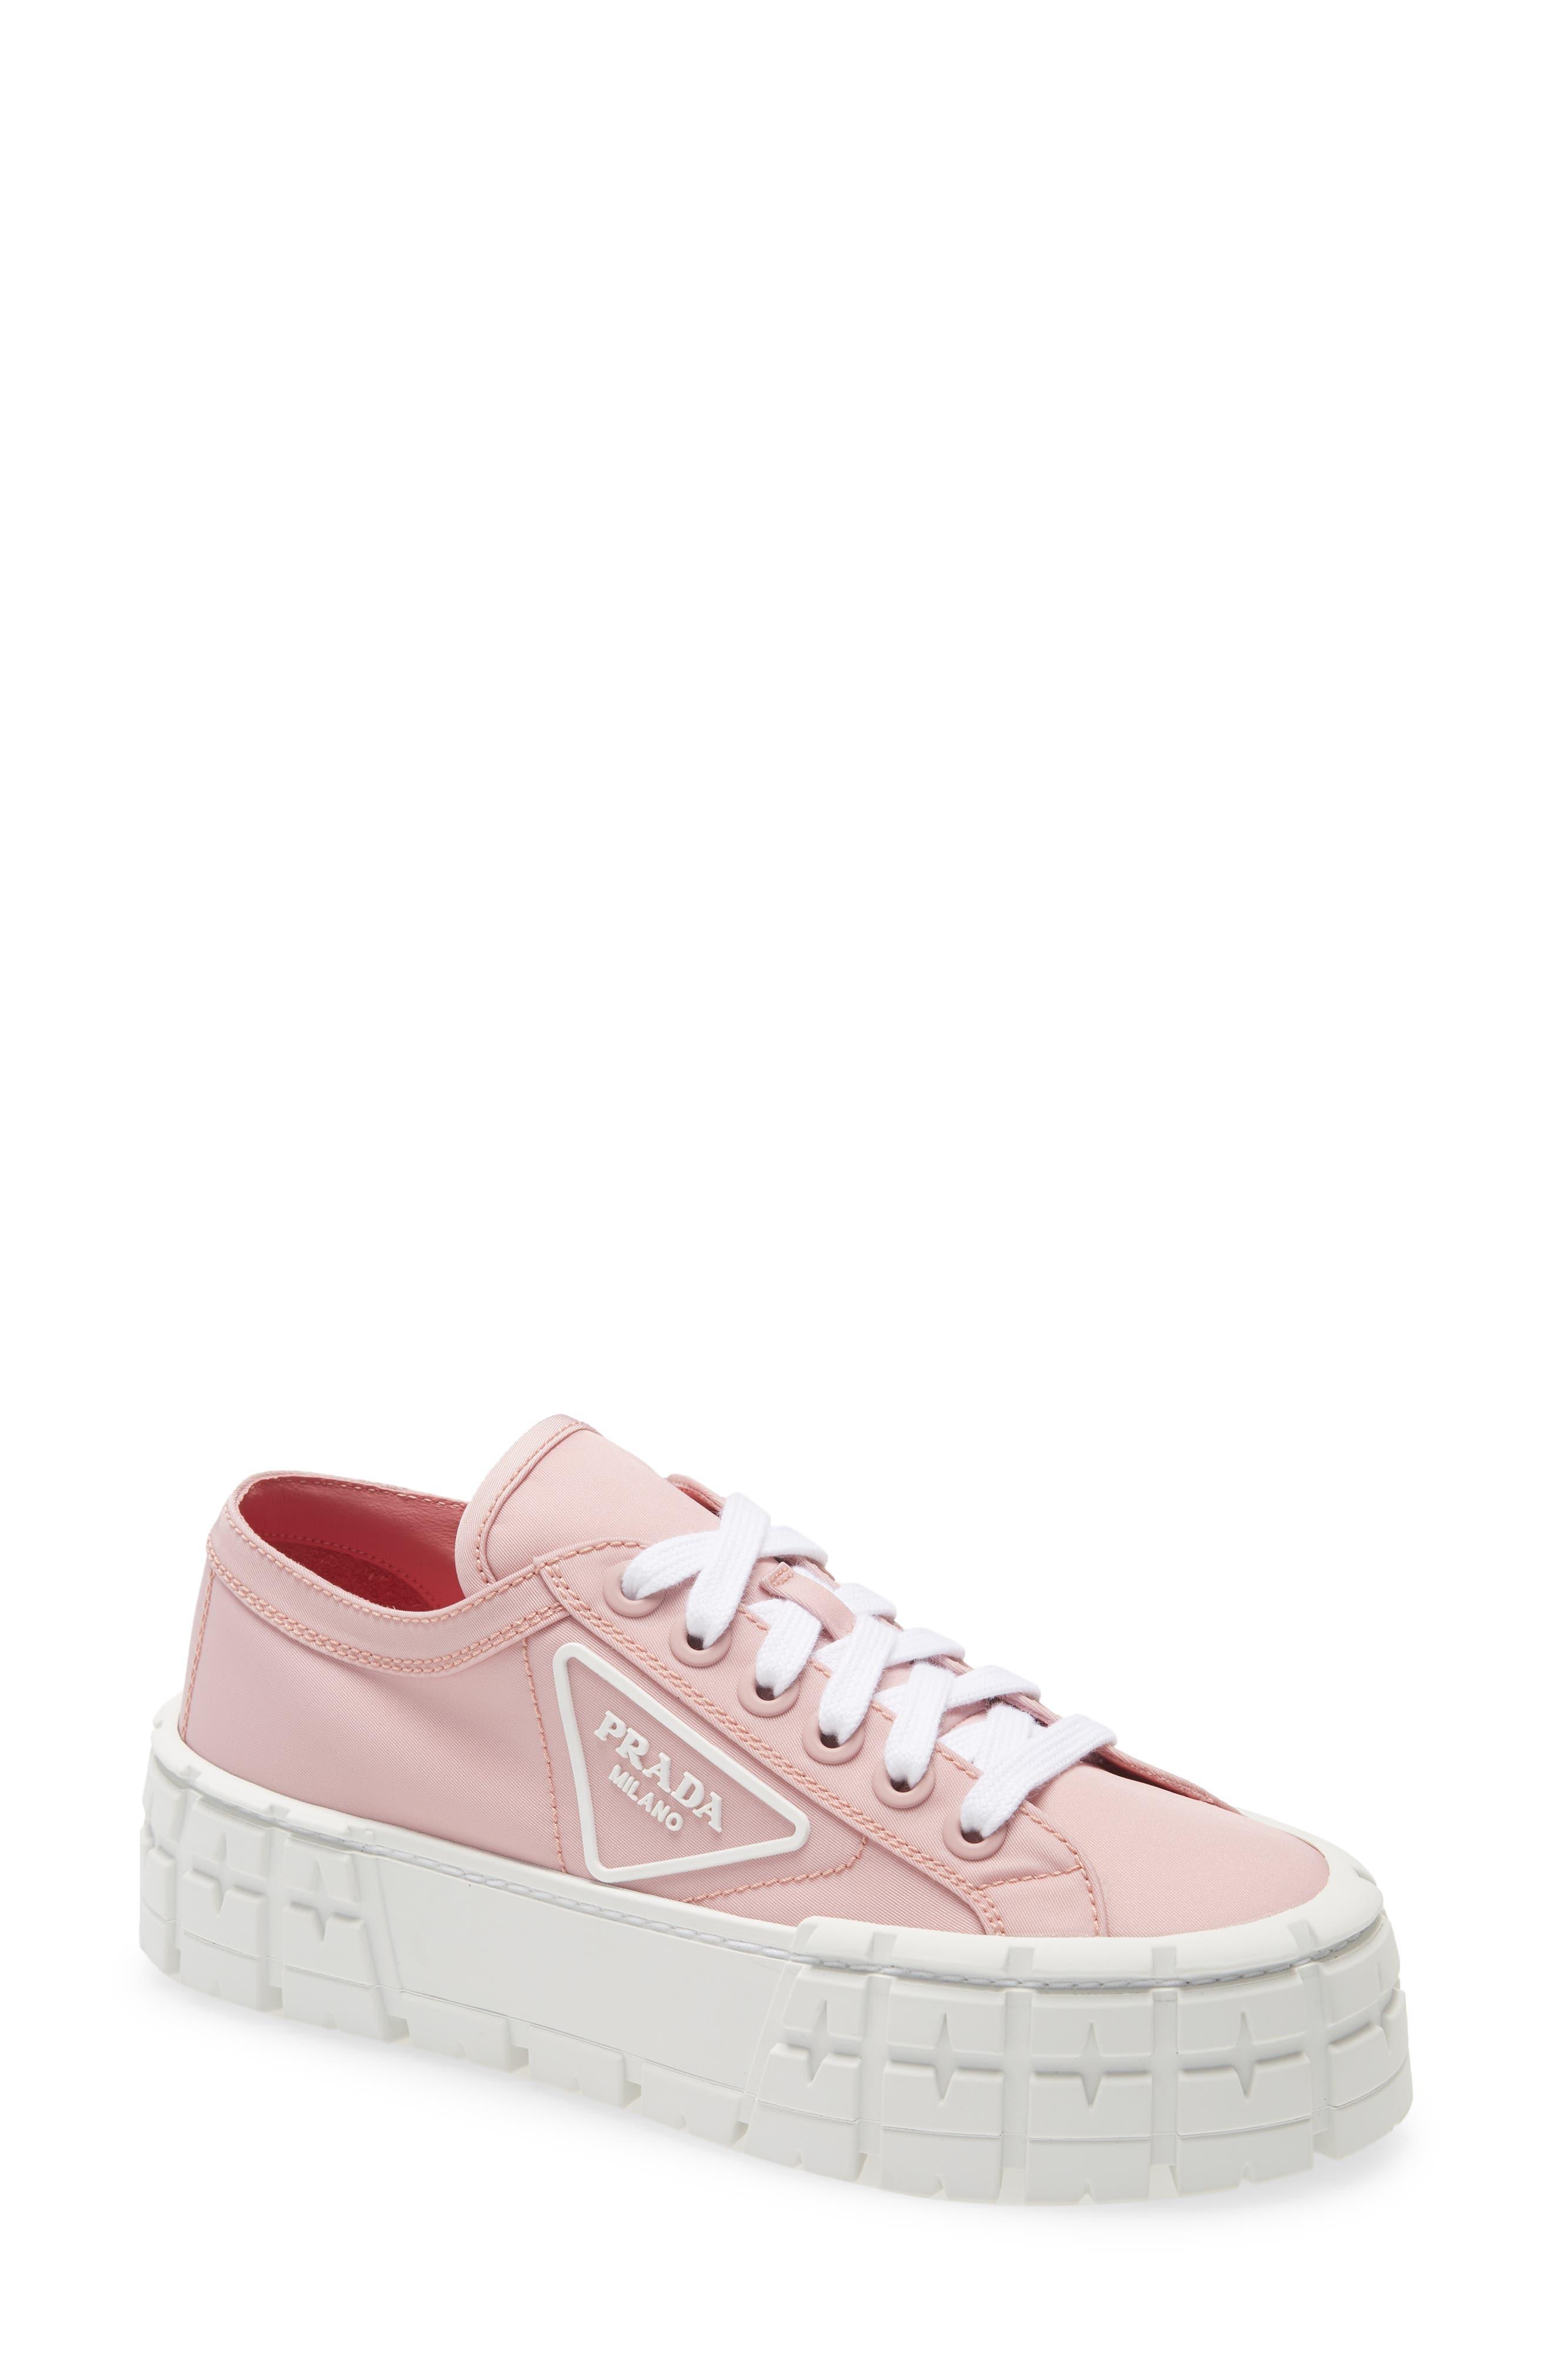 Women's Prada Shoes   Nordstrom